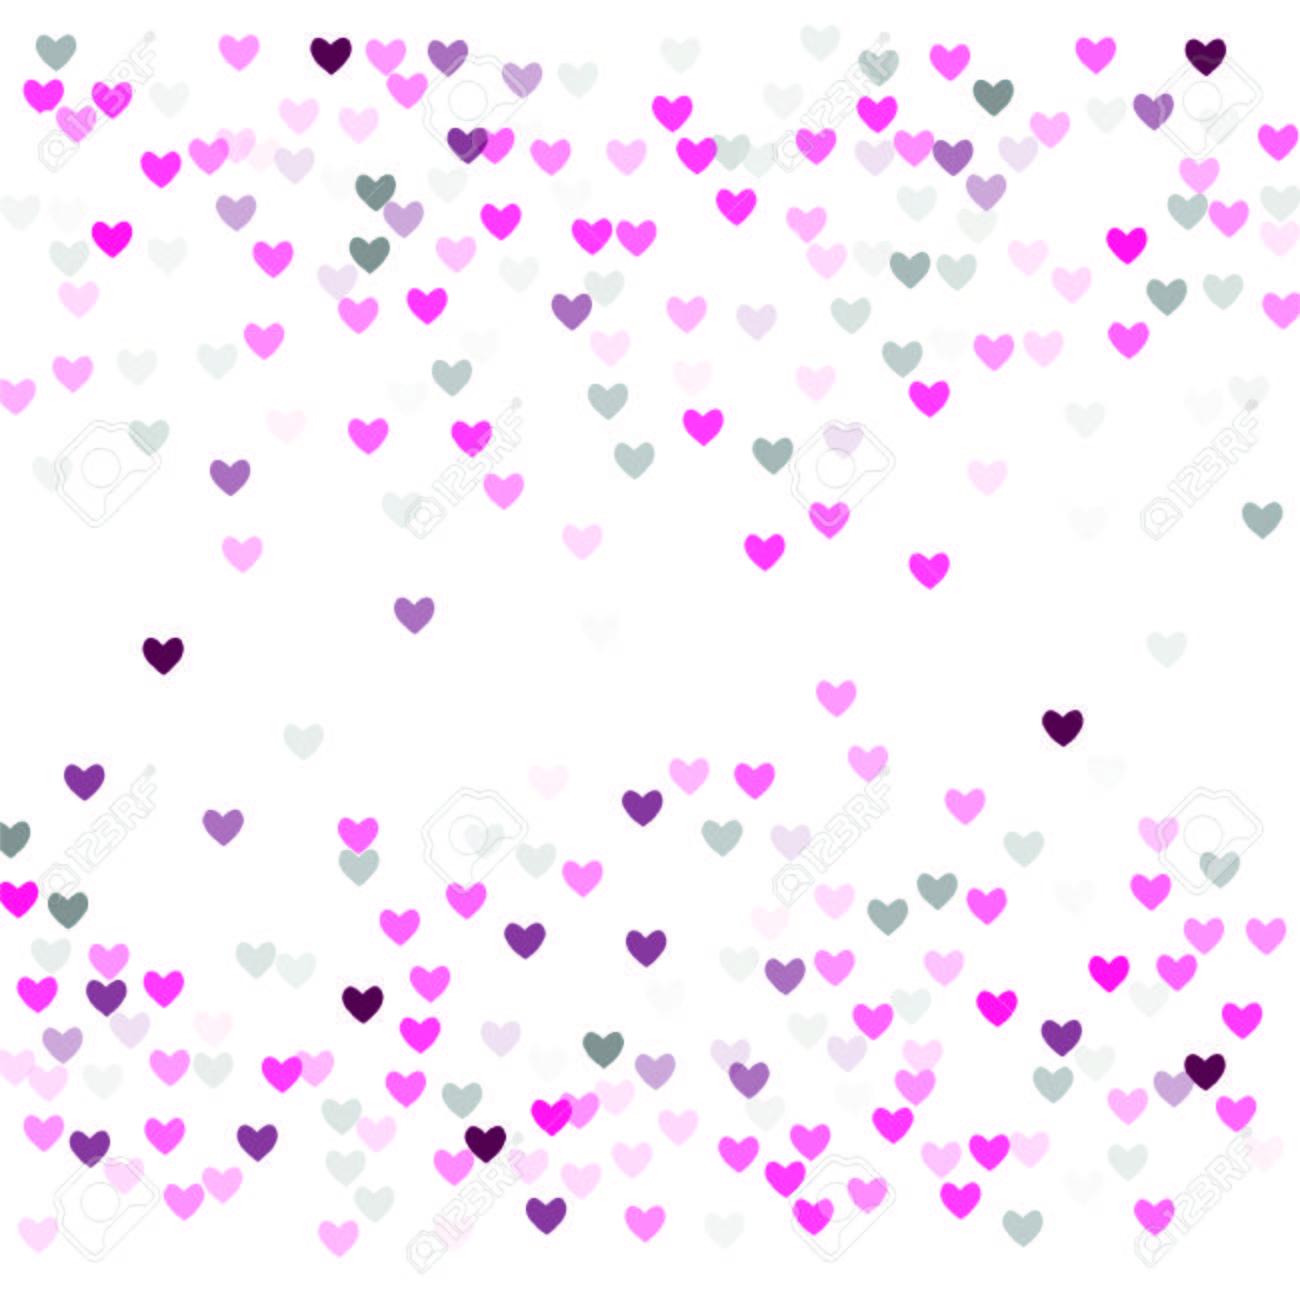 Beautiful Pink Confetti Hearts Falling On White Background